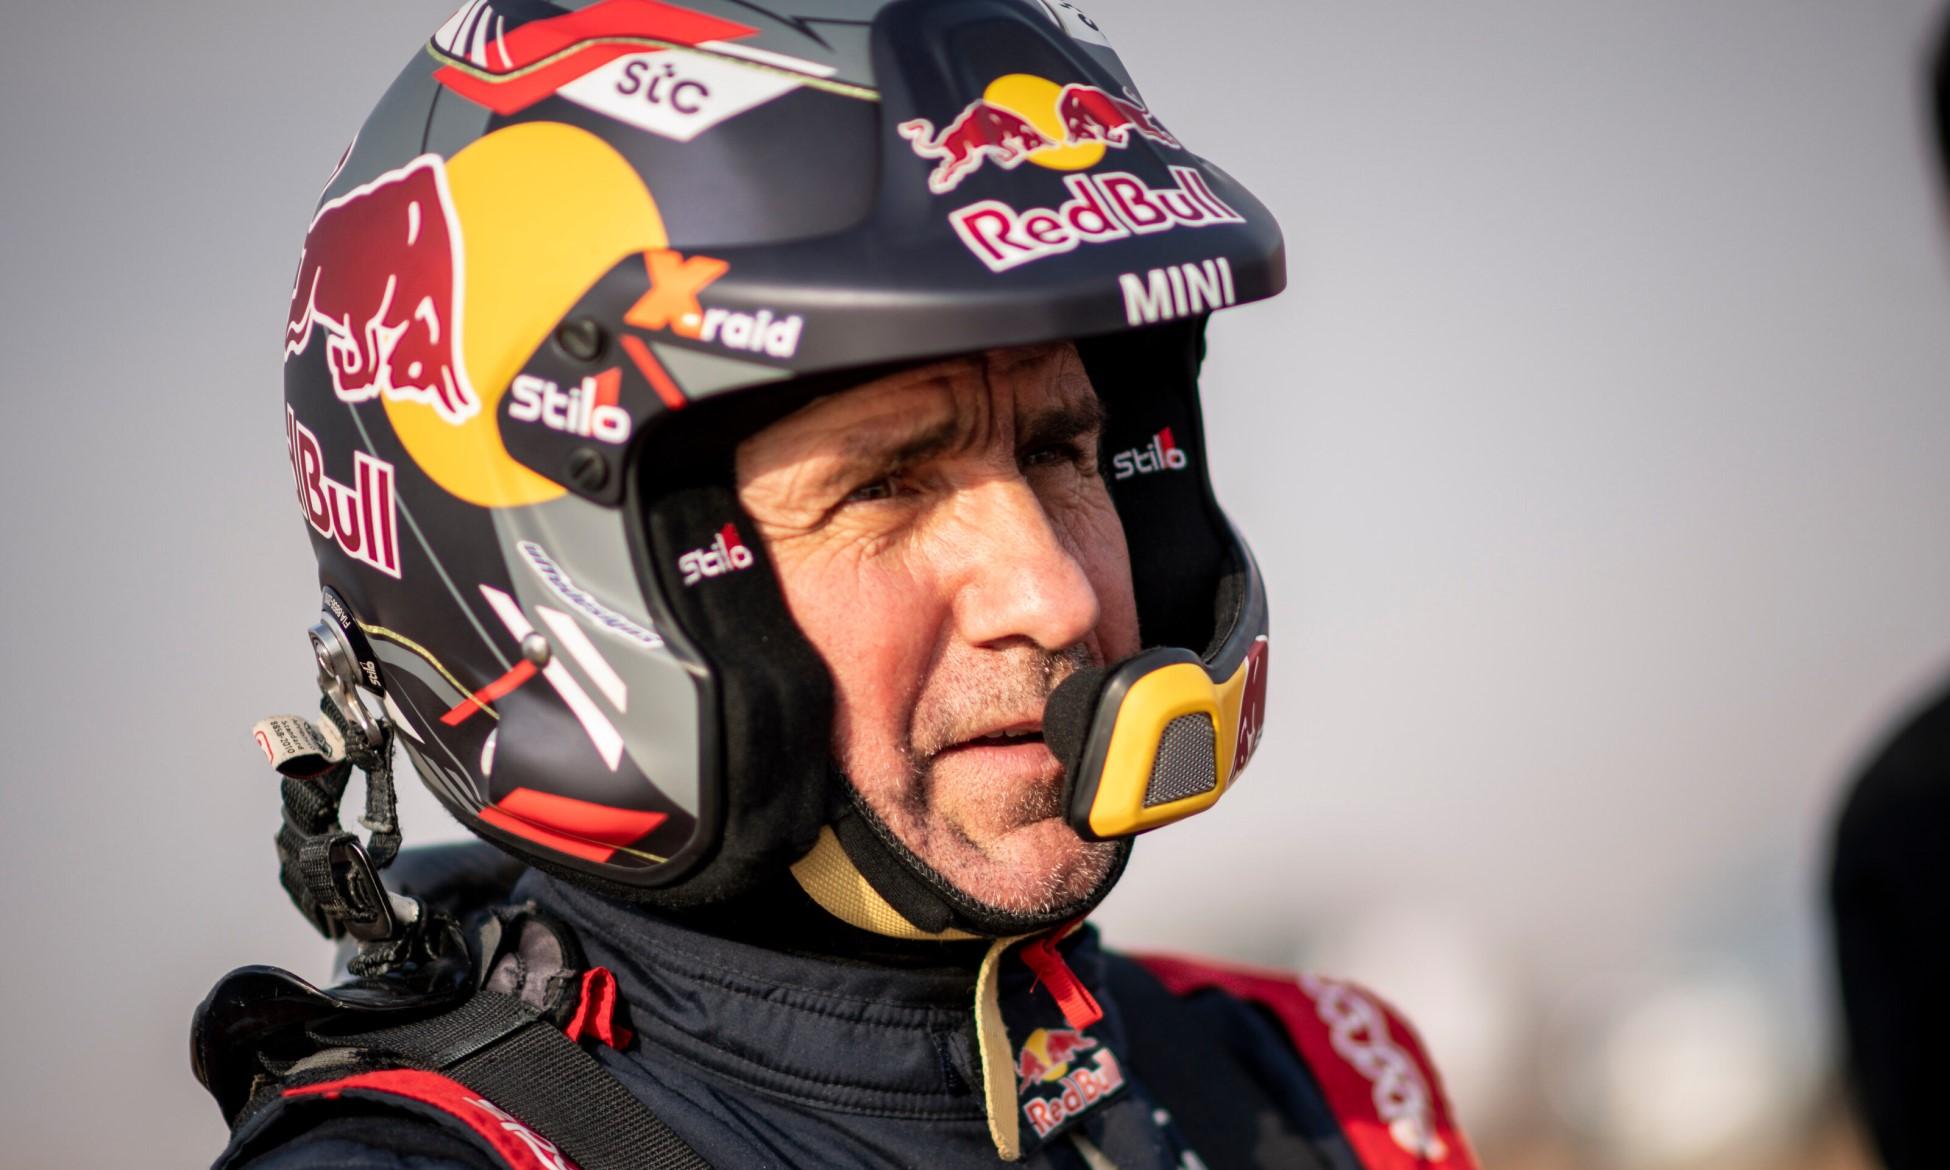 Stephane Peterhansel won his 14th Dakar Rally in 2021